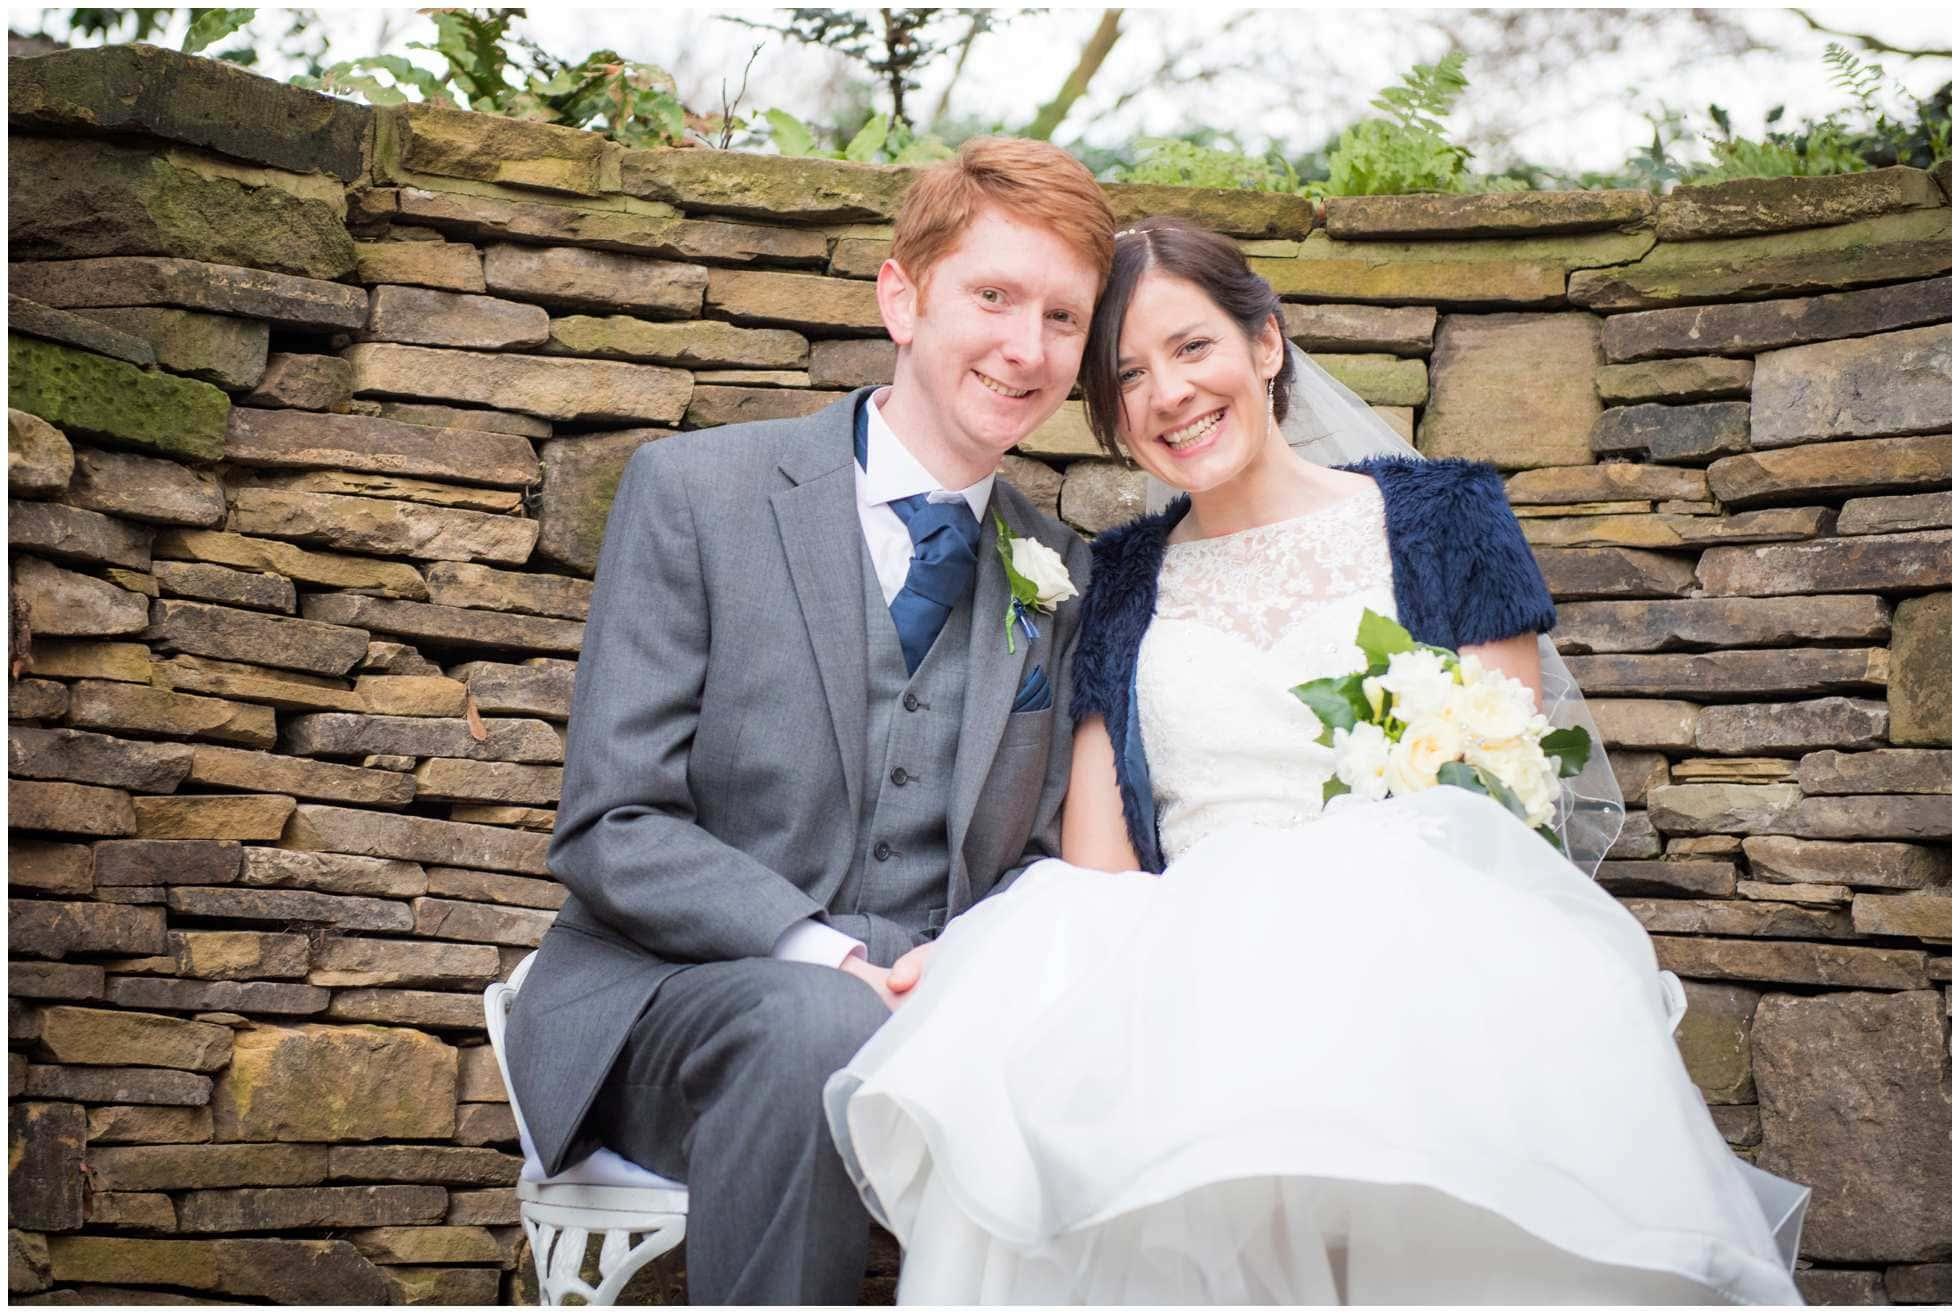 Marriott Hotel York Wedding Photographer Winston Sanders shot of beautiful bride and group on bench in garden